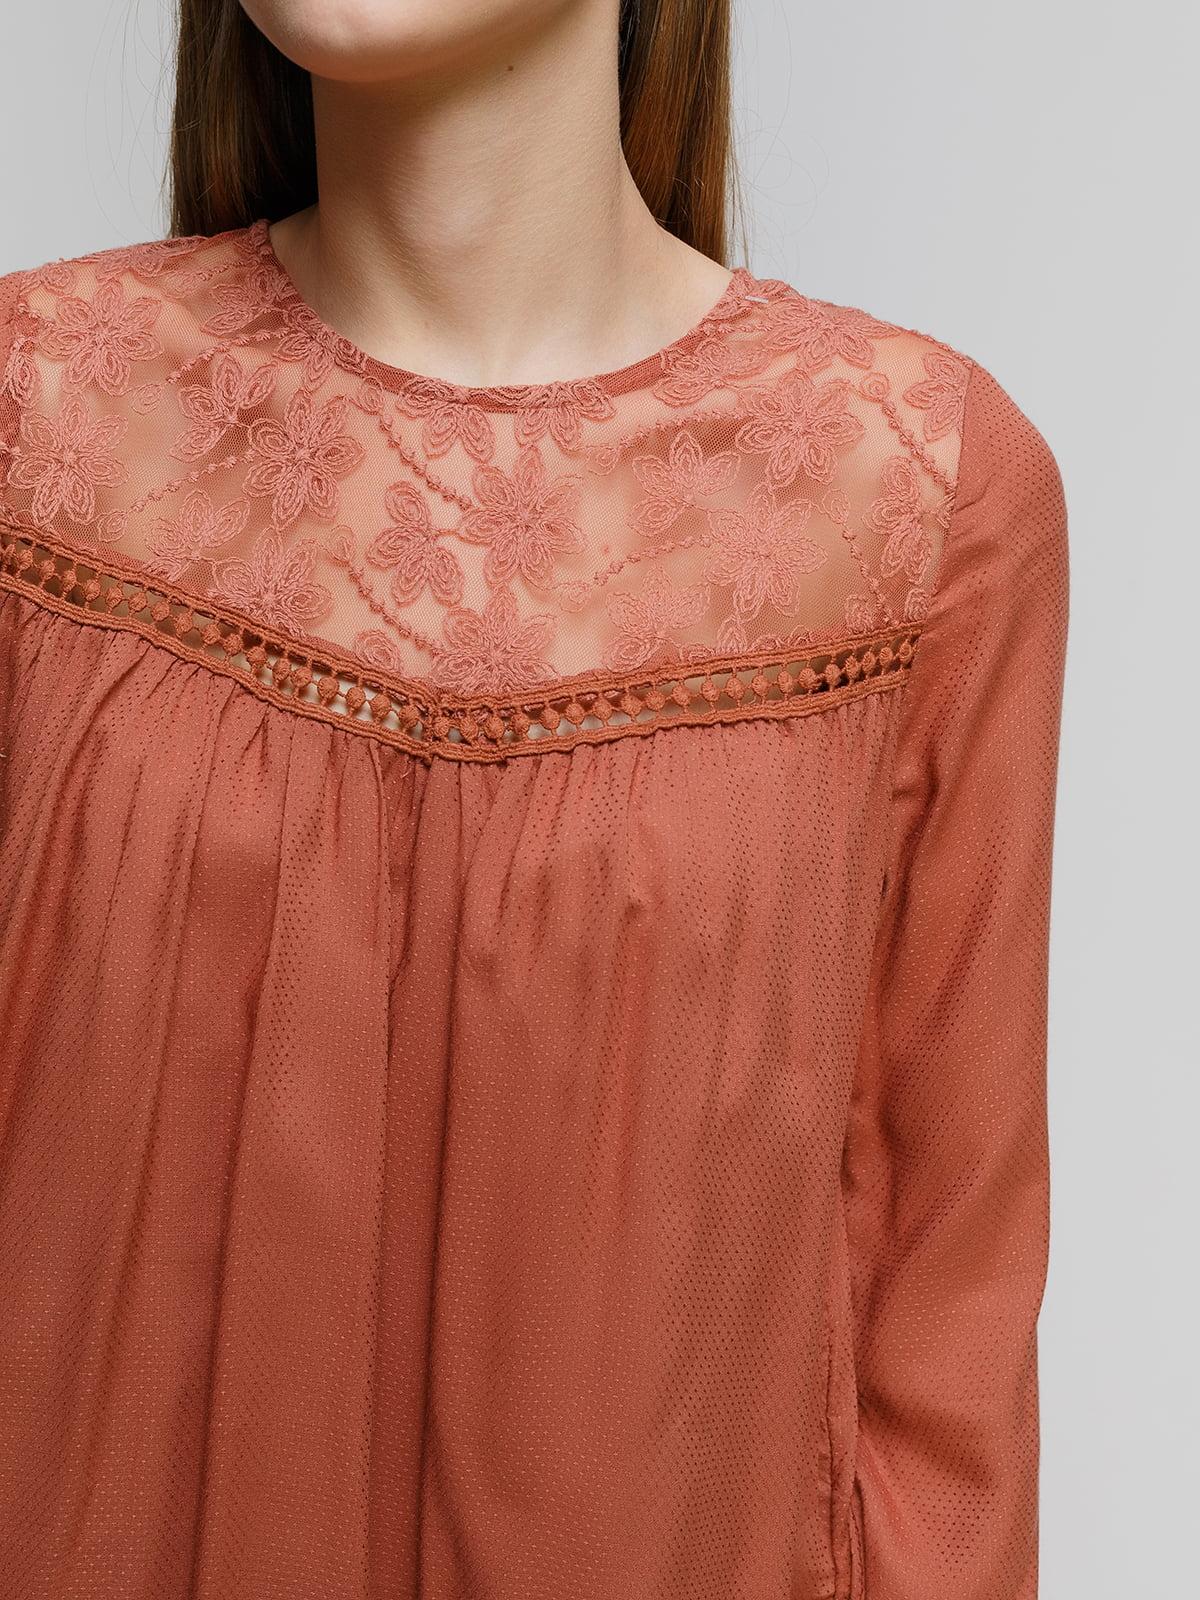 Блуза терракотовая   4628446   фото 3